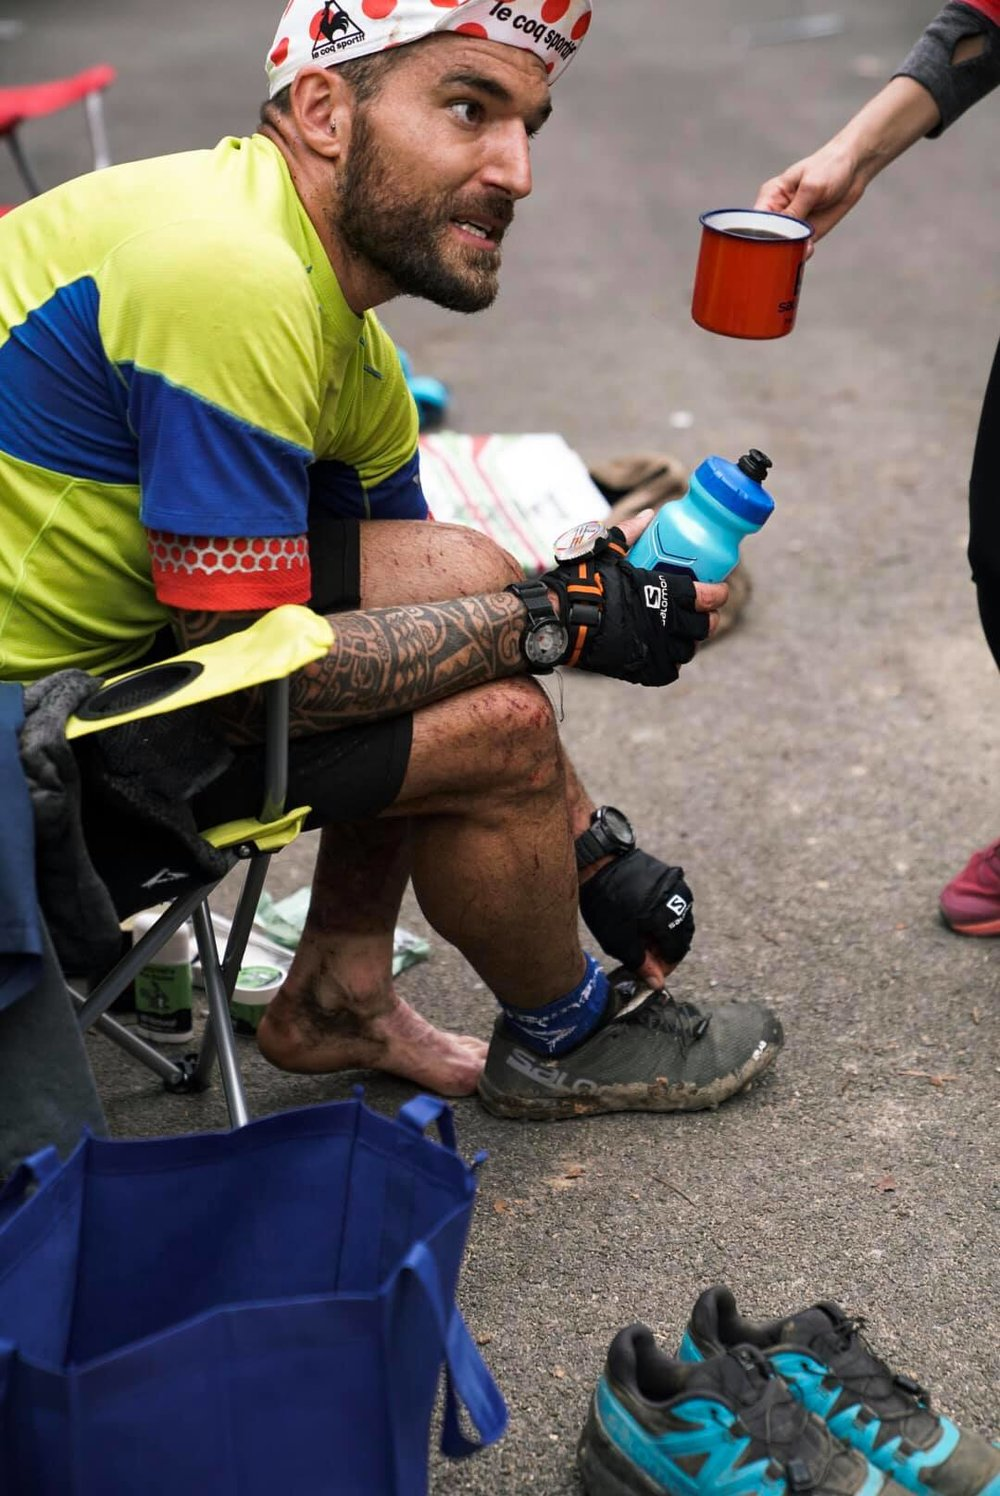 Coach_Terry_Wilson_Pursuit_of_The_Perfect_Race_Barkleys_Marathon_Guillaume_Calmettes_8.jpg